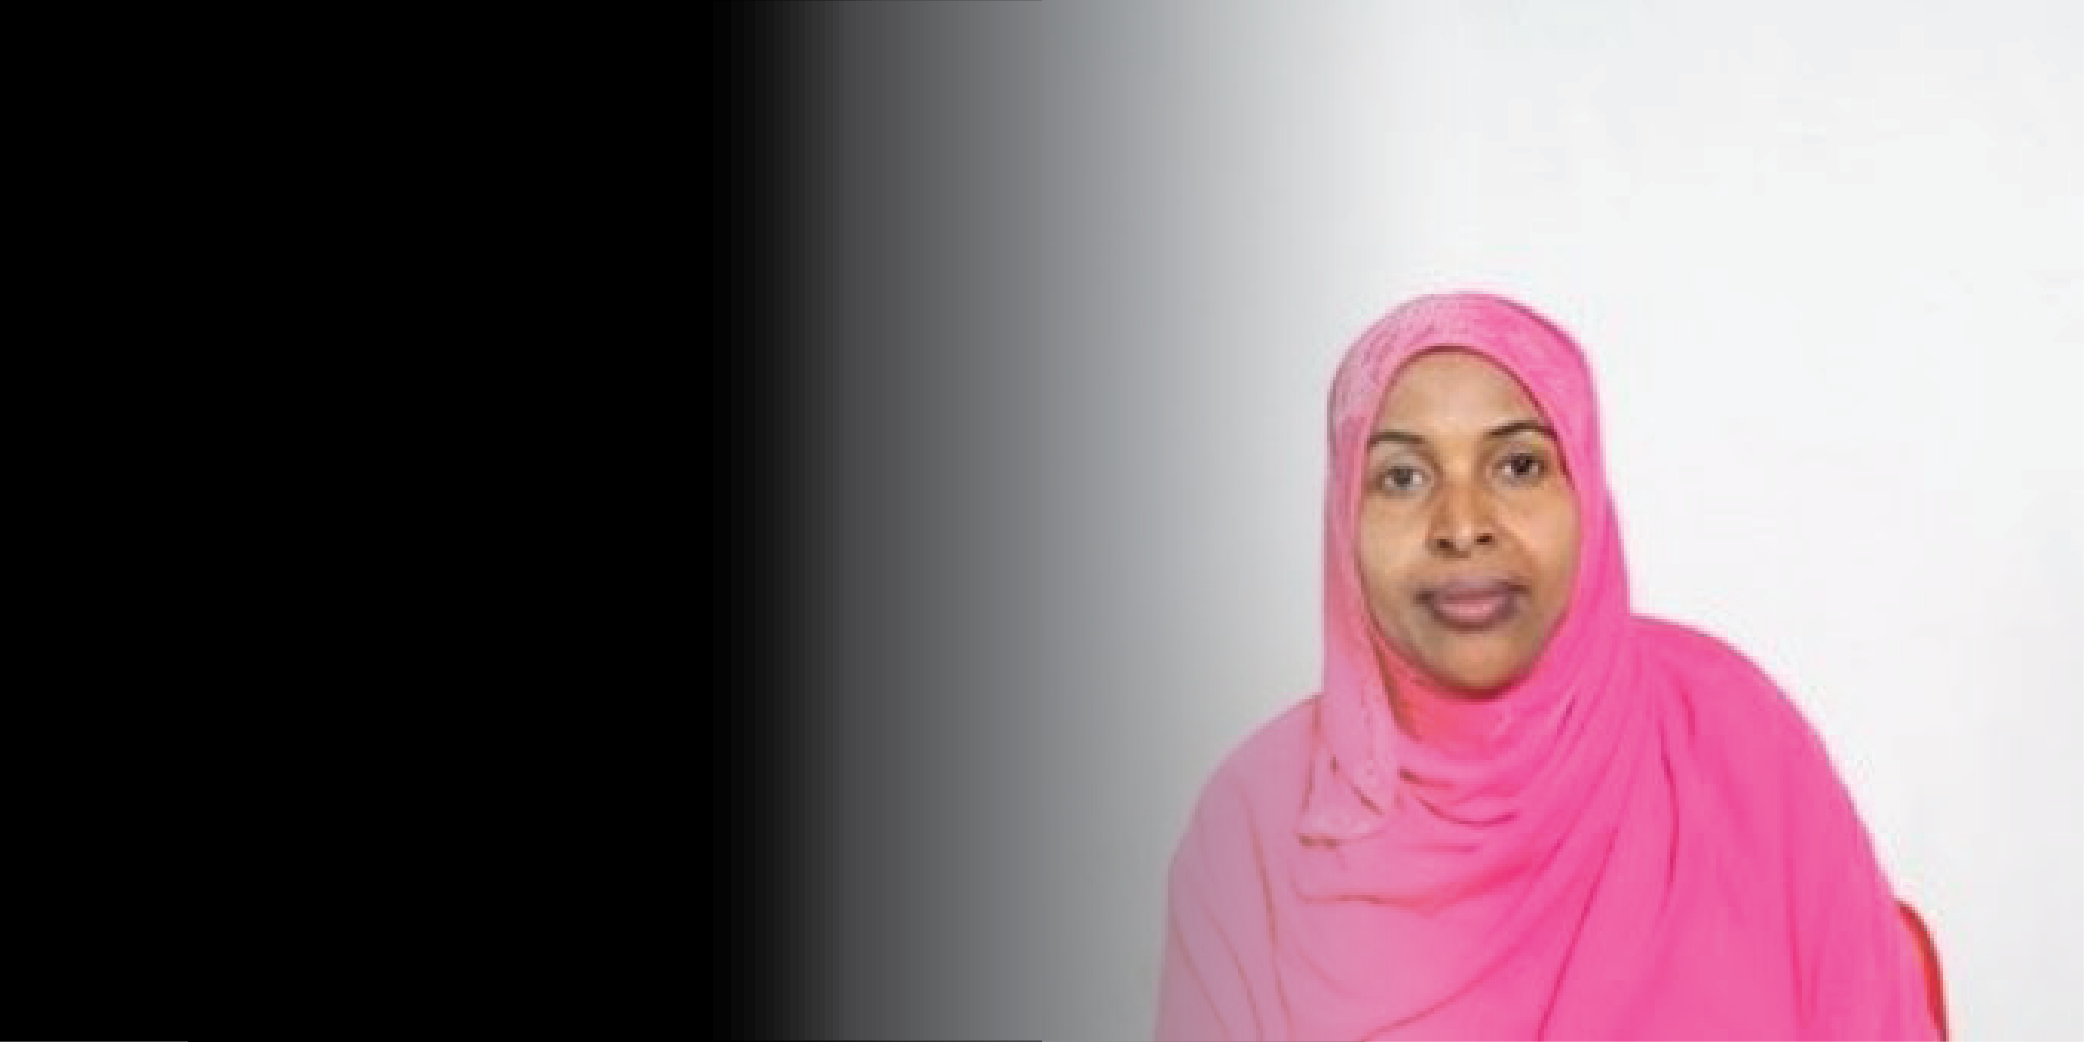 Nura Aided Ibrahim